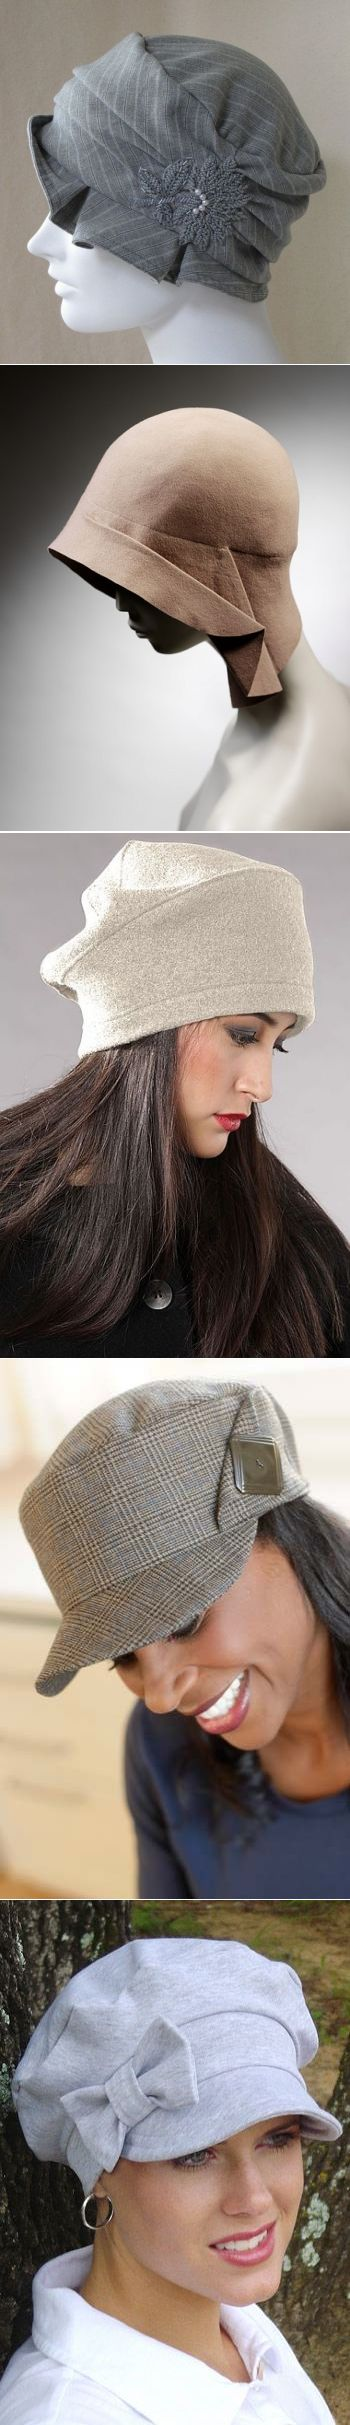 Chapéus e turbantes